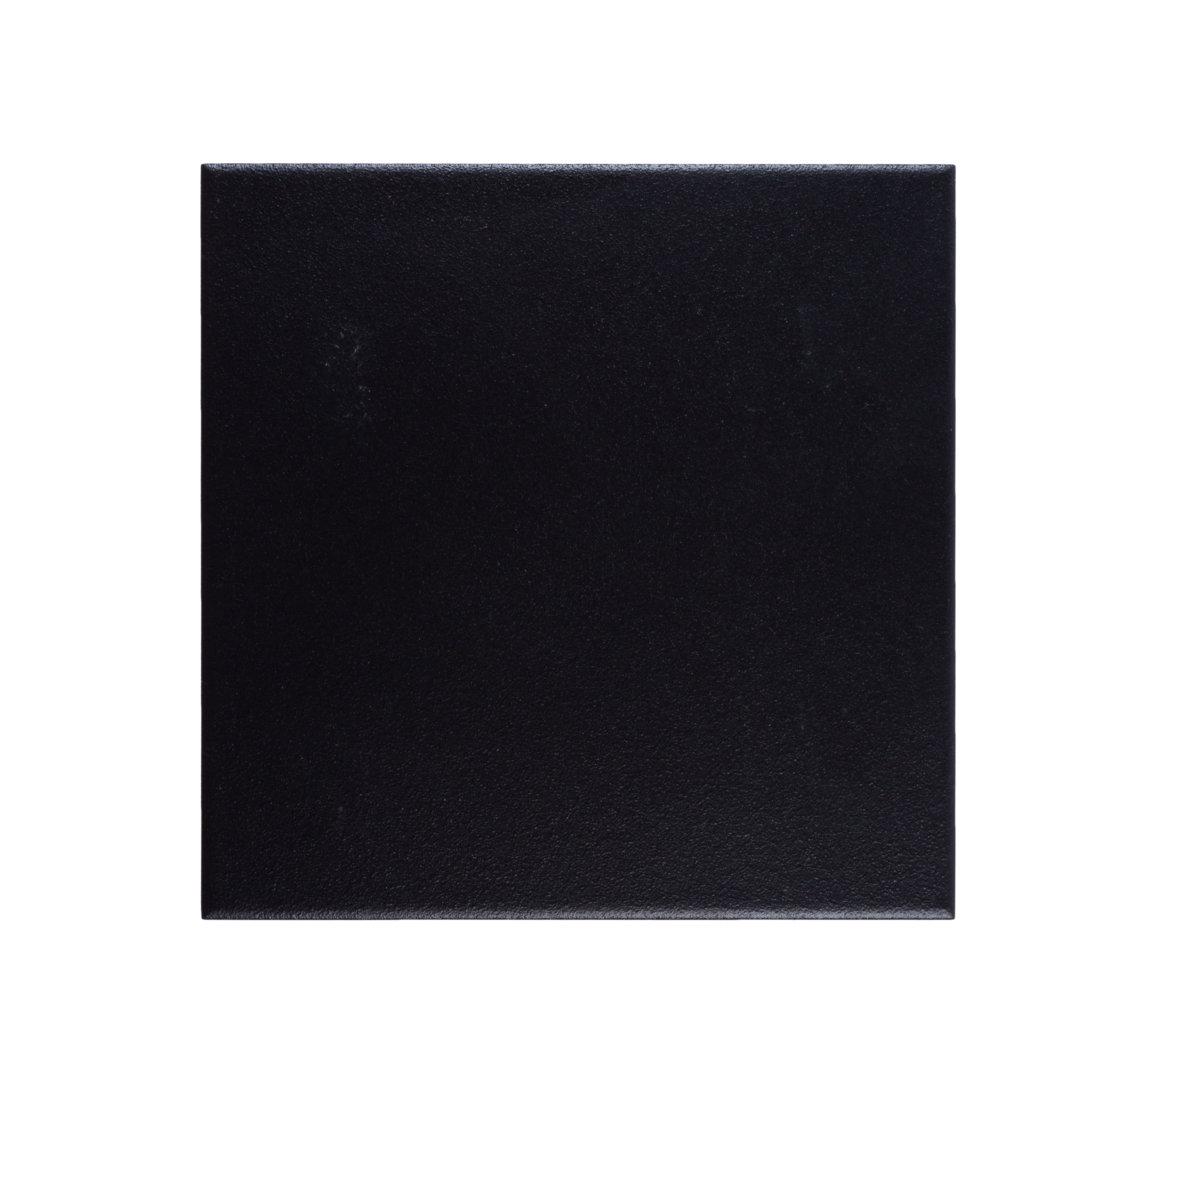 CRS Antigua Base Black 200x200mm_Stiles_Product_Image